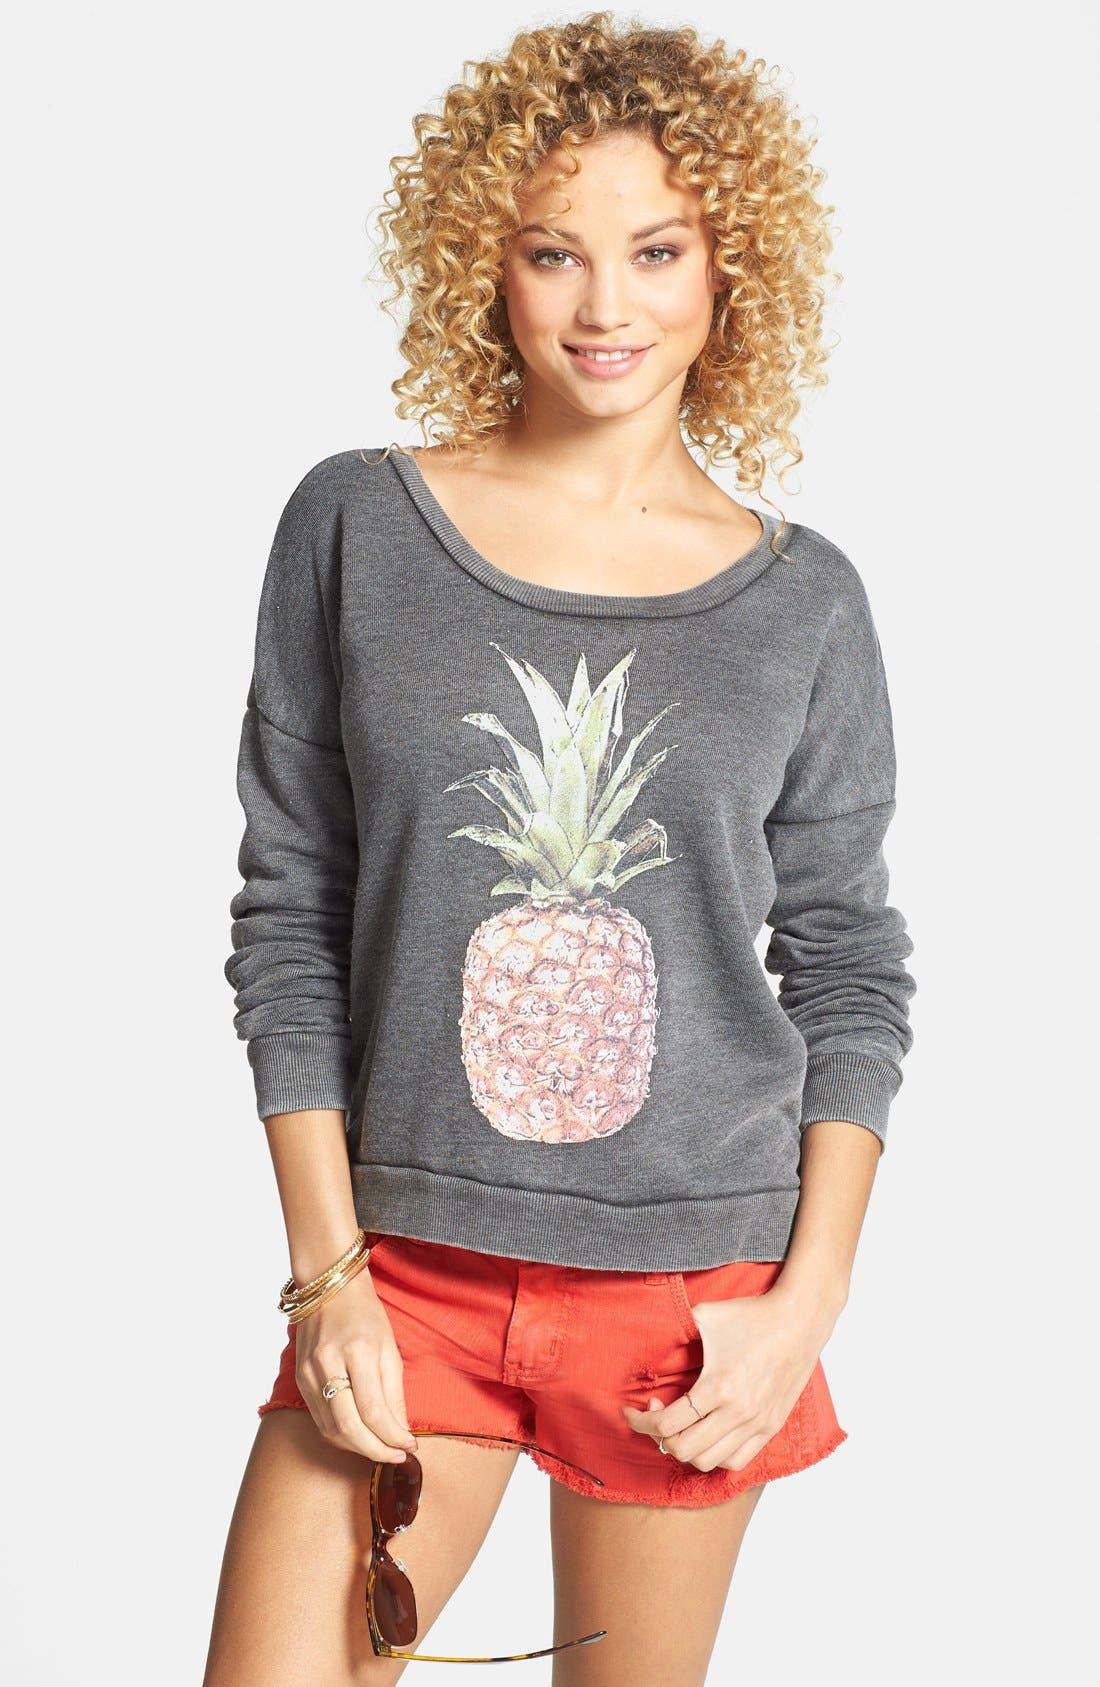 Main Image - Billabong 'She Sells' Pineapple Print Pullover (Juniors) (Online Only)